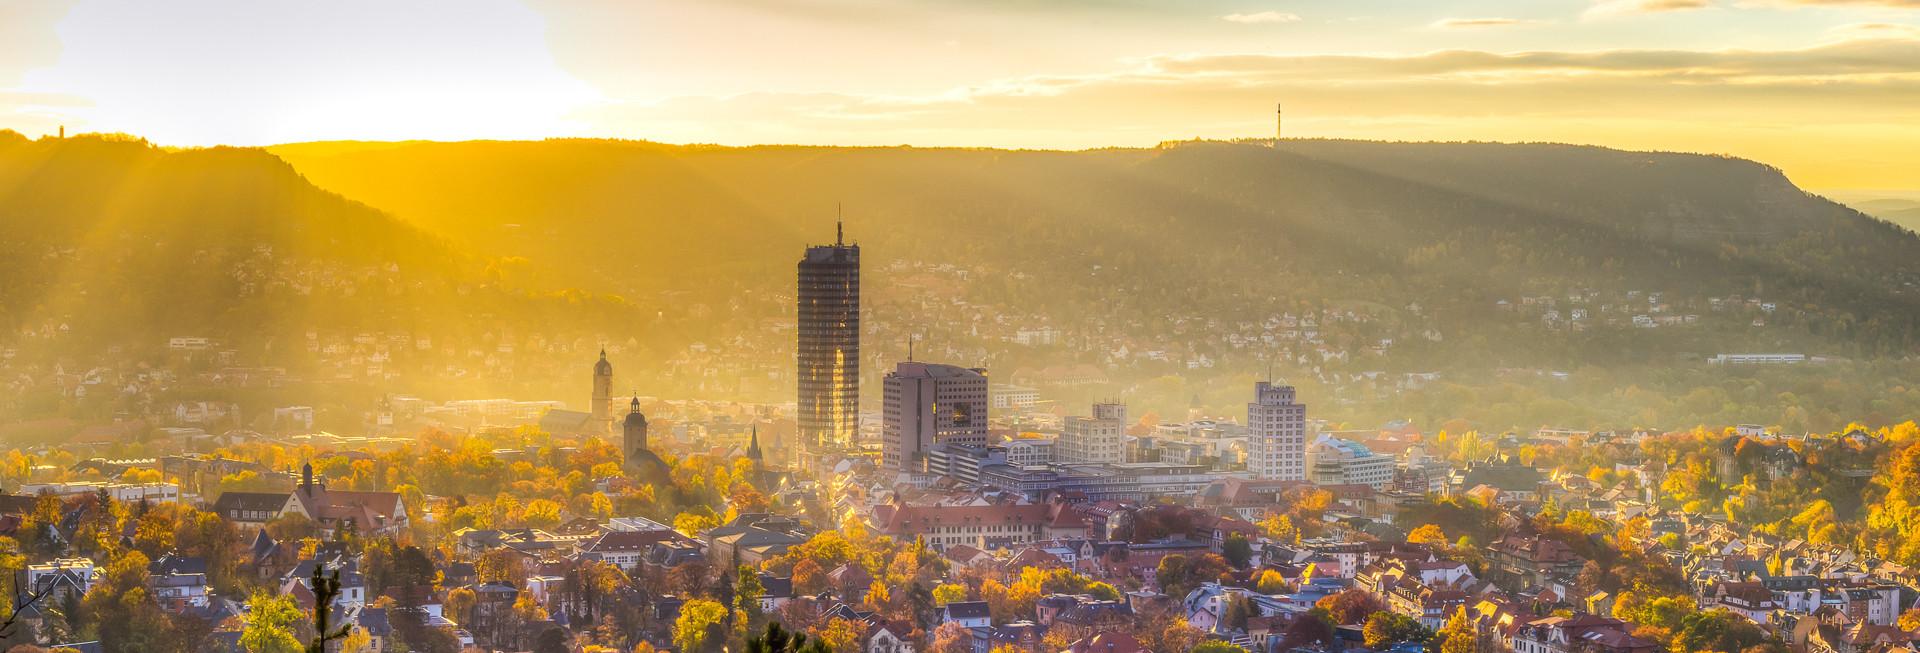 Jena_Panorama_Bild_Herbststadt_Sonnenber